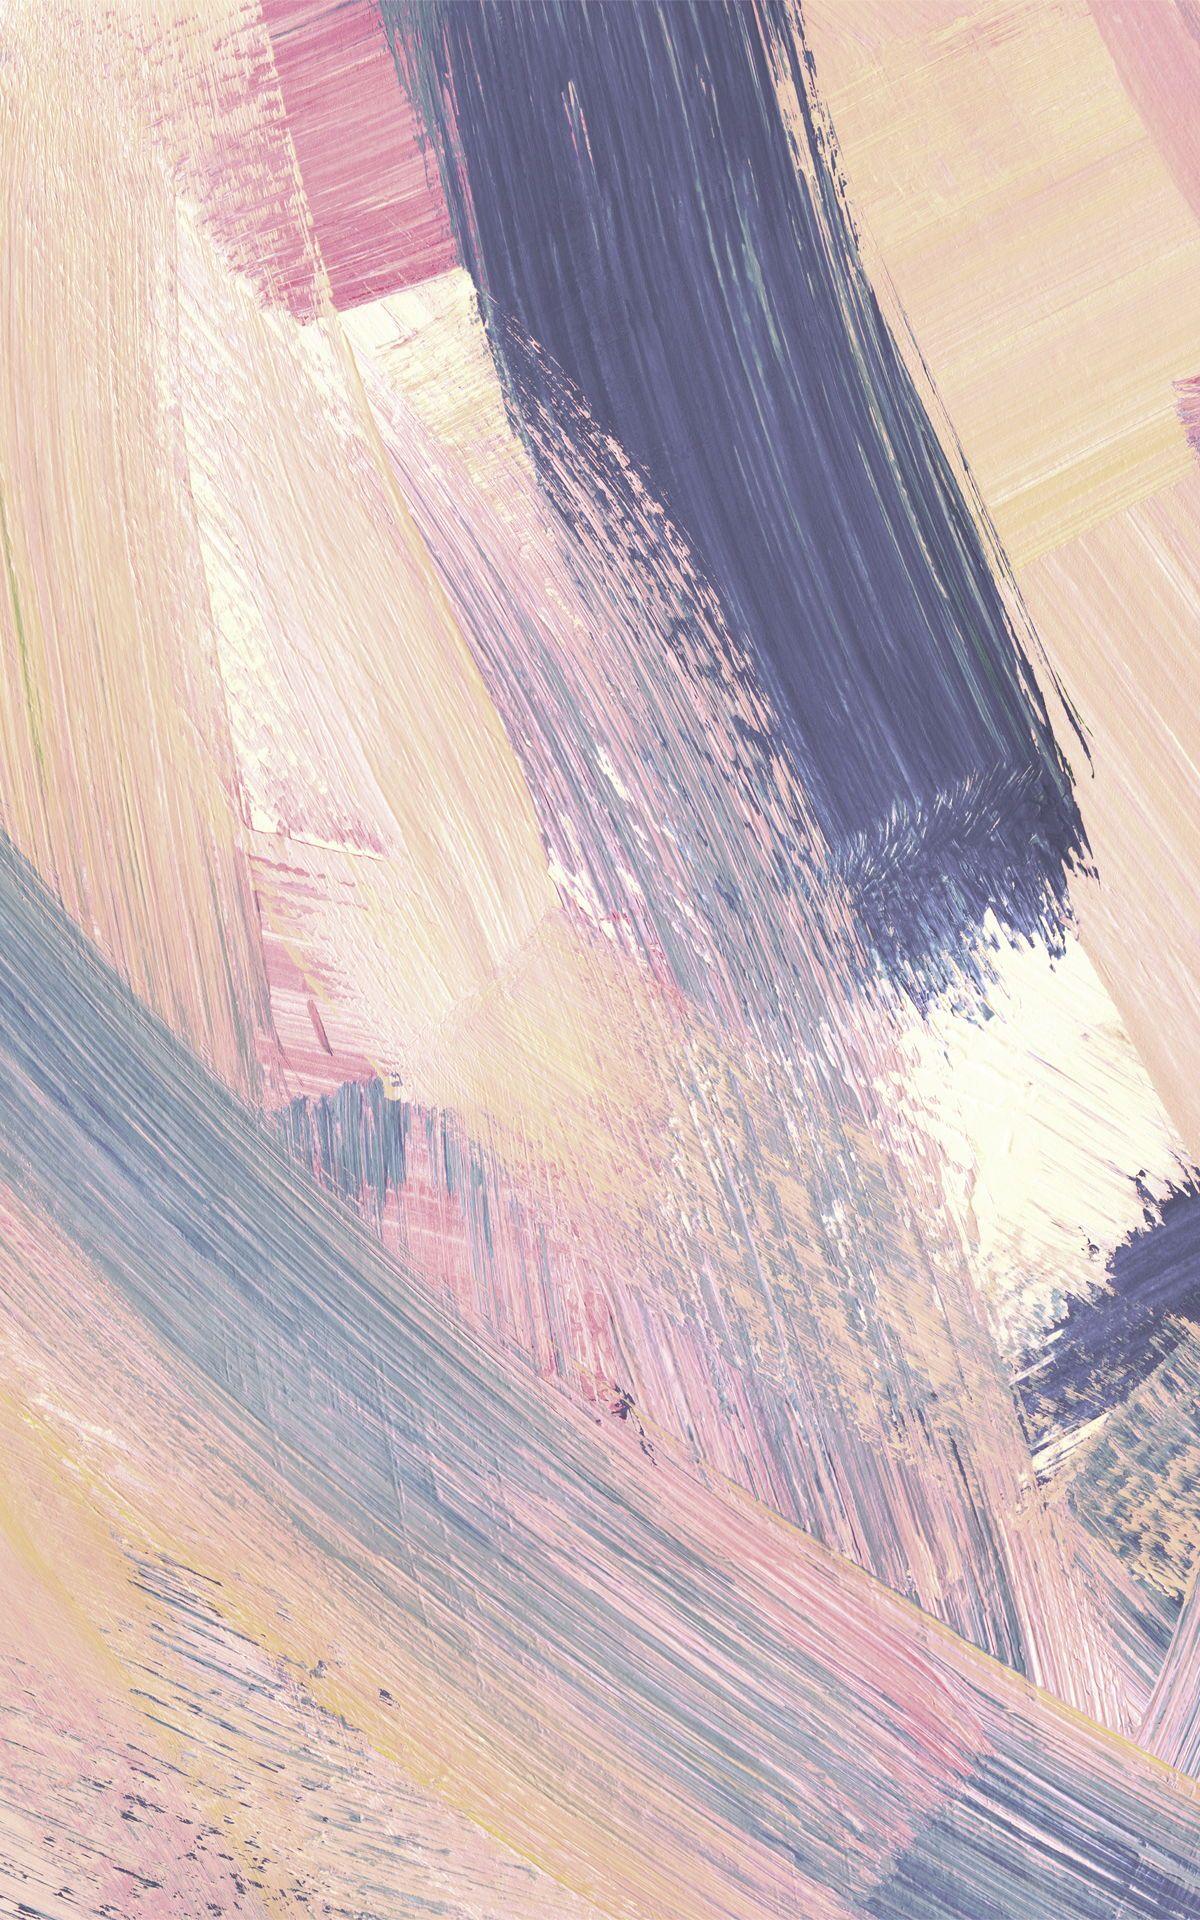 Pink & Peach Abstract Paint Brush Strokes Wallpaper   MuralsWallpaper